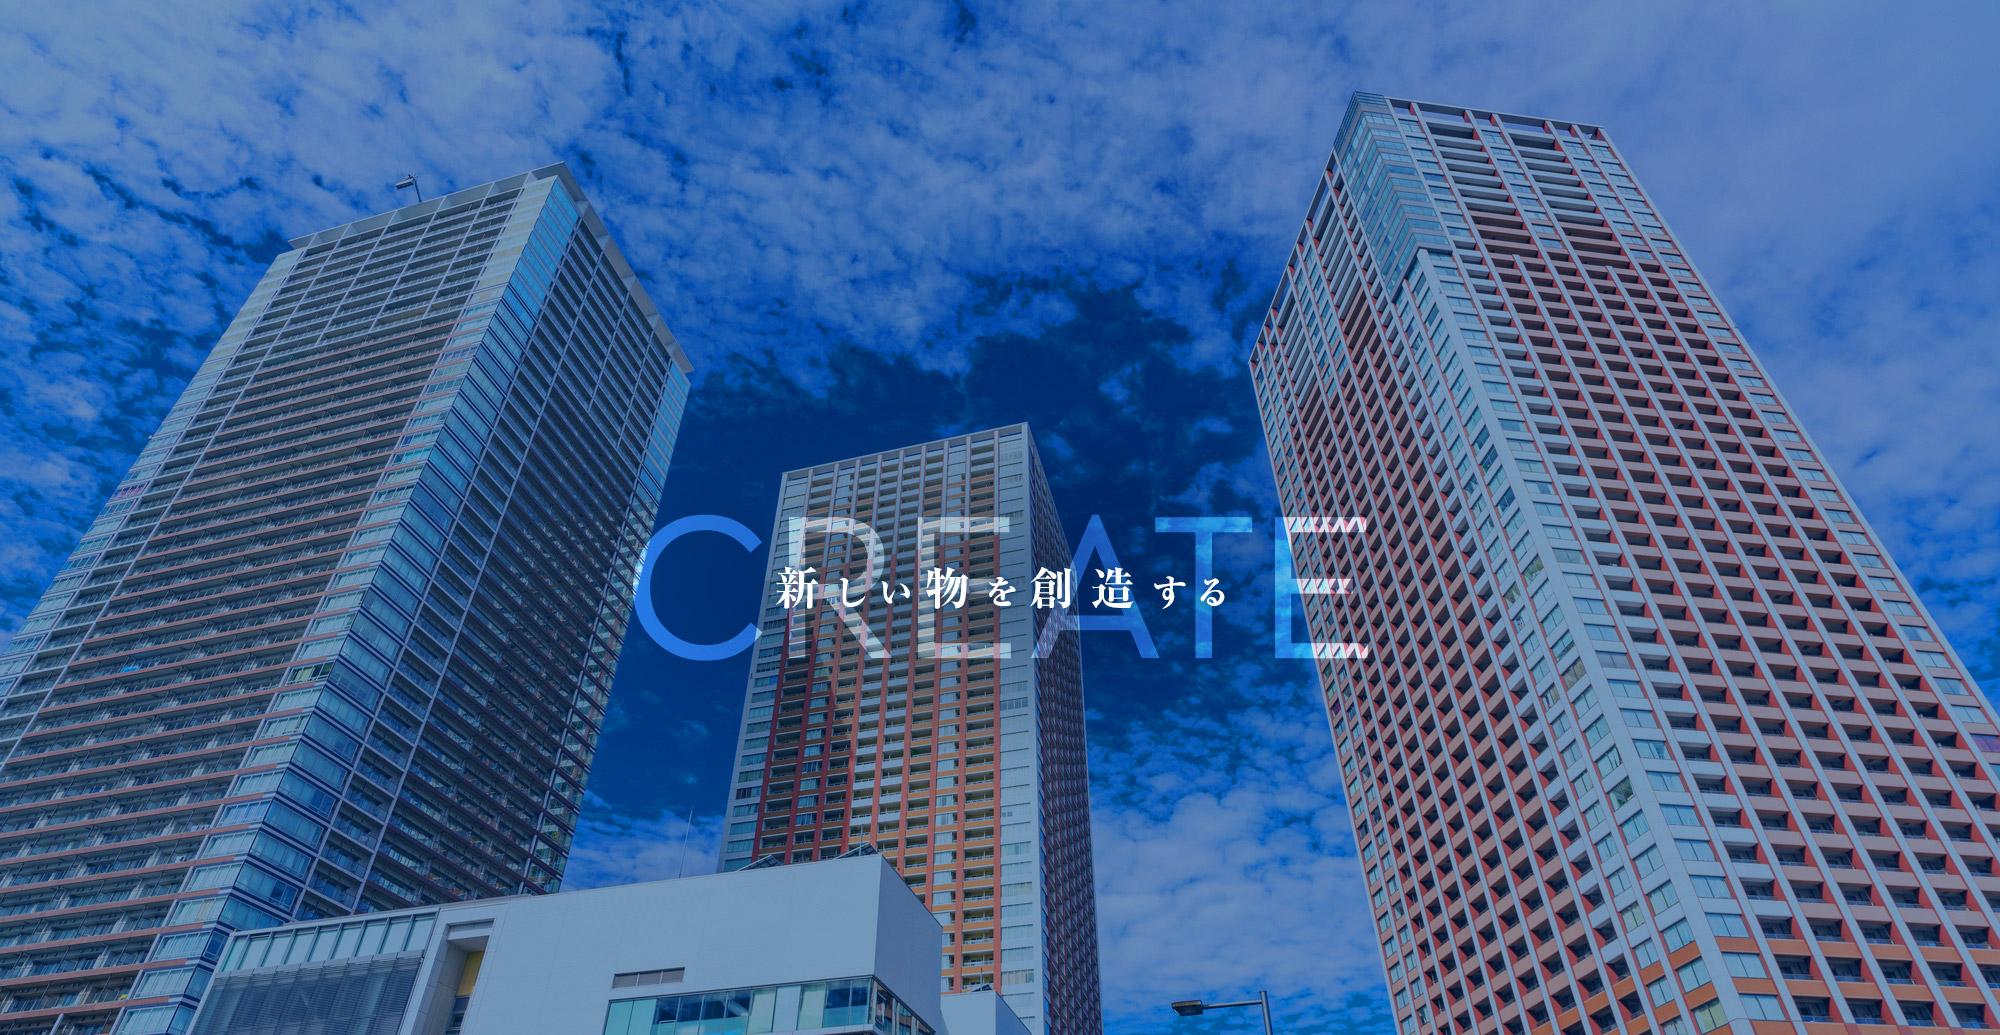 Create 新しい物を創造する